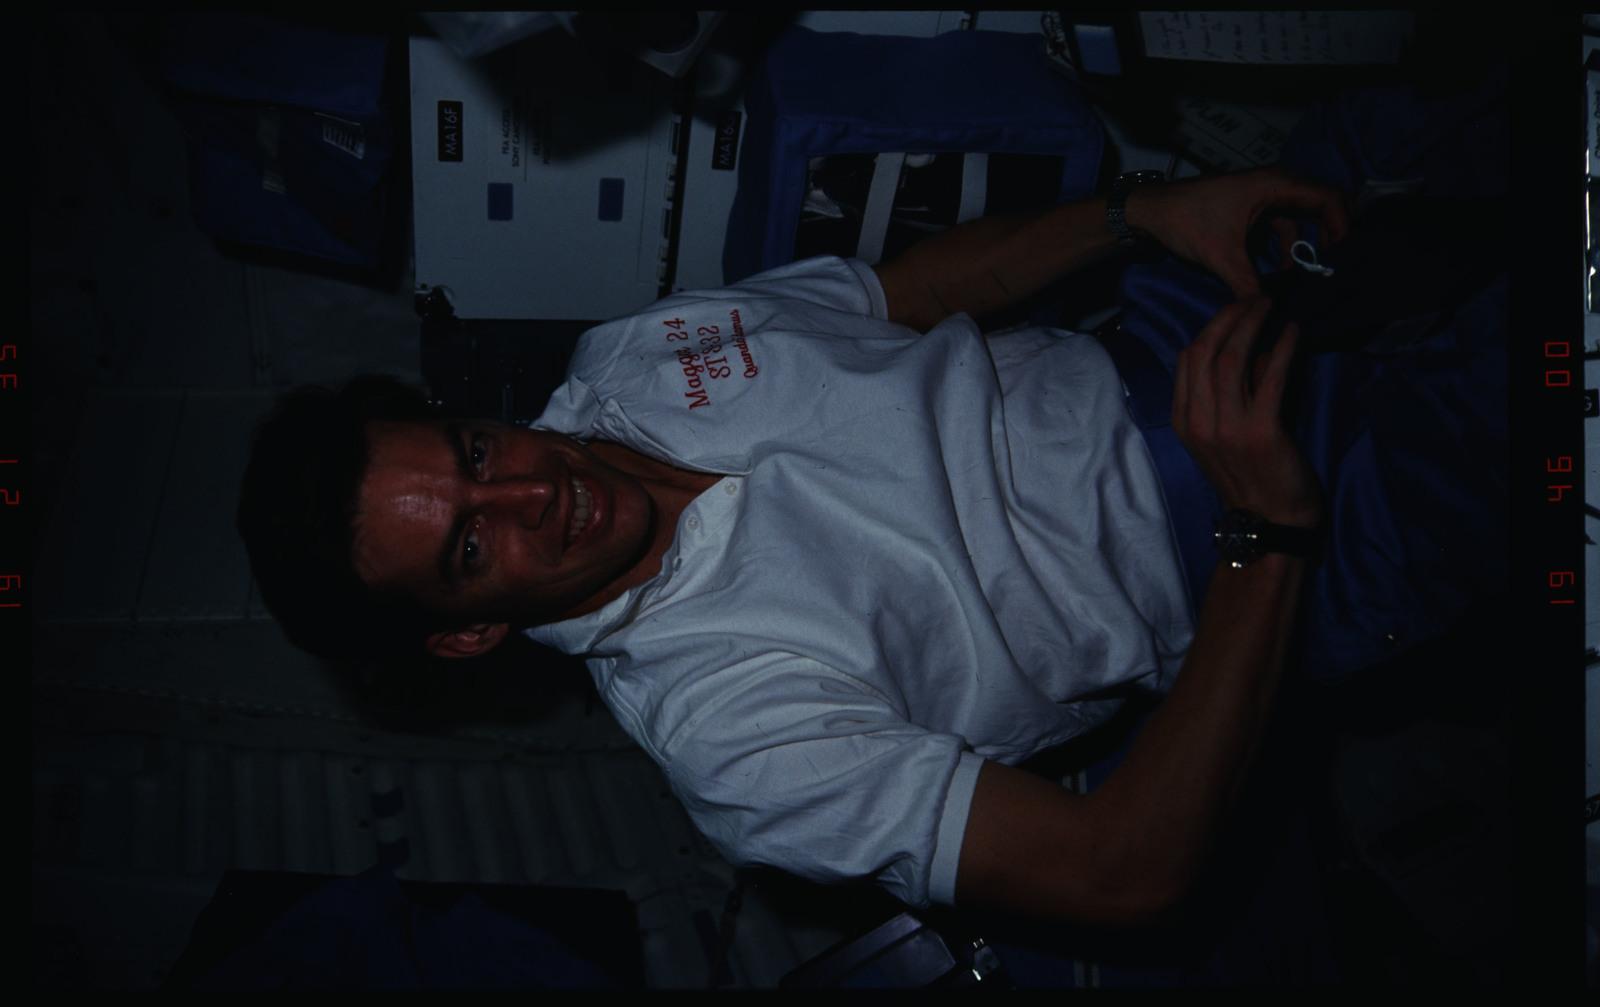 S32-16-019 - STS-032 - STS-32 crew activities